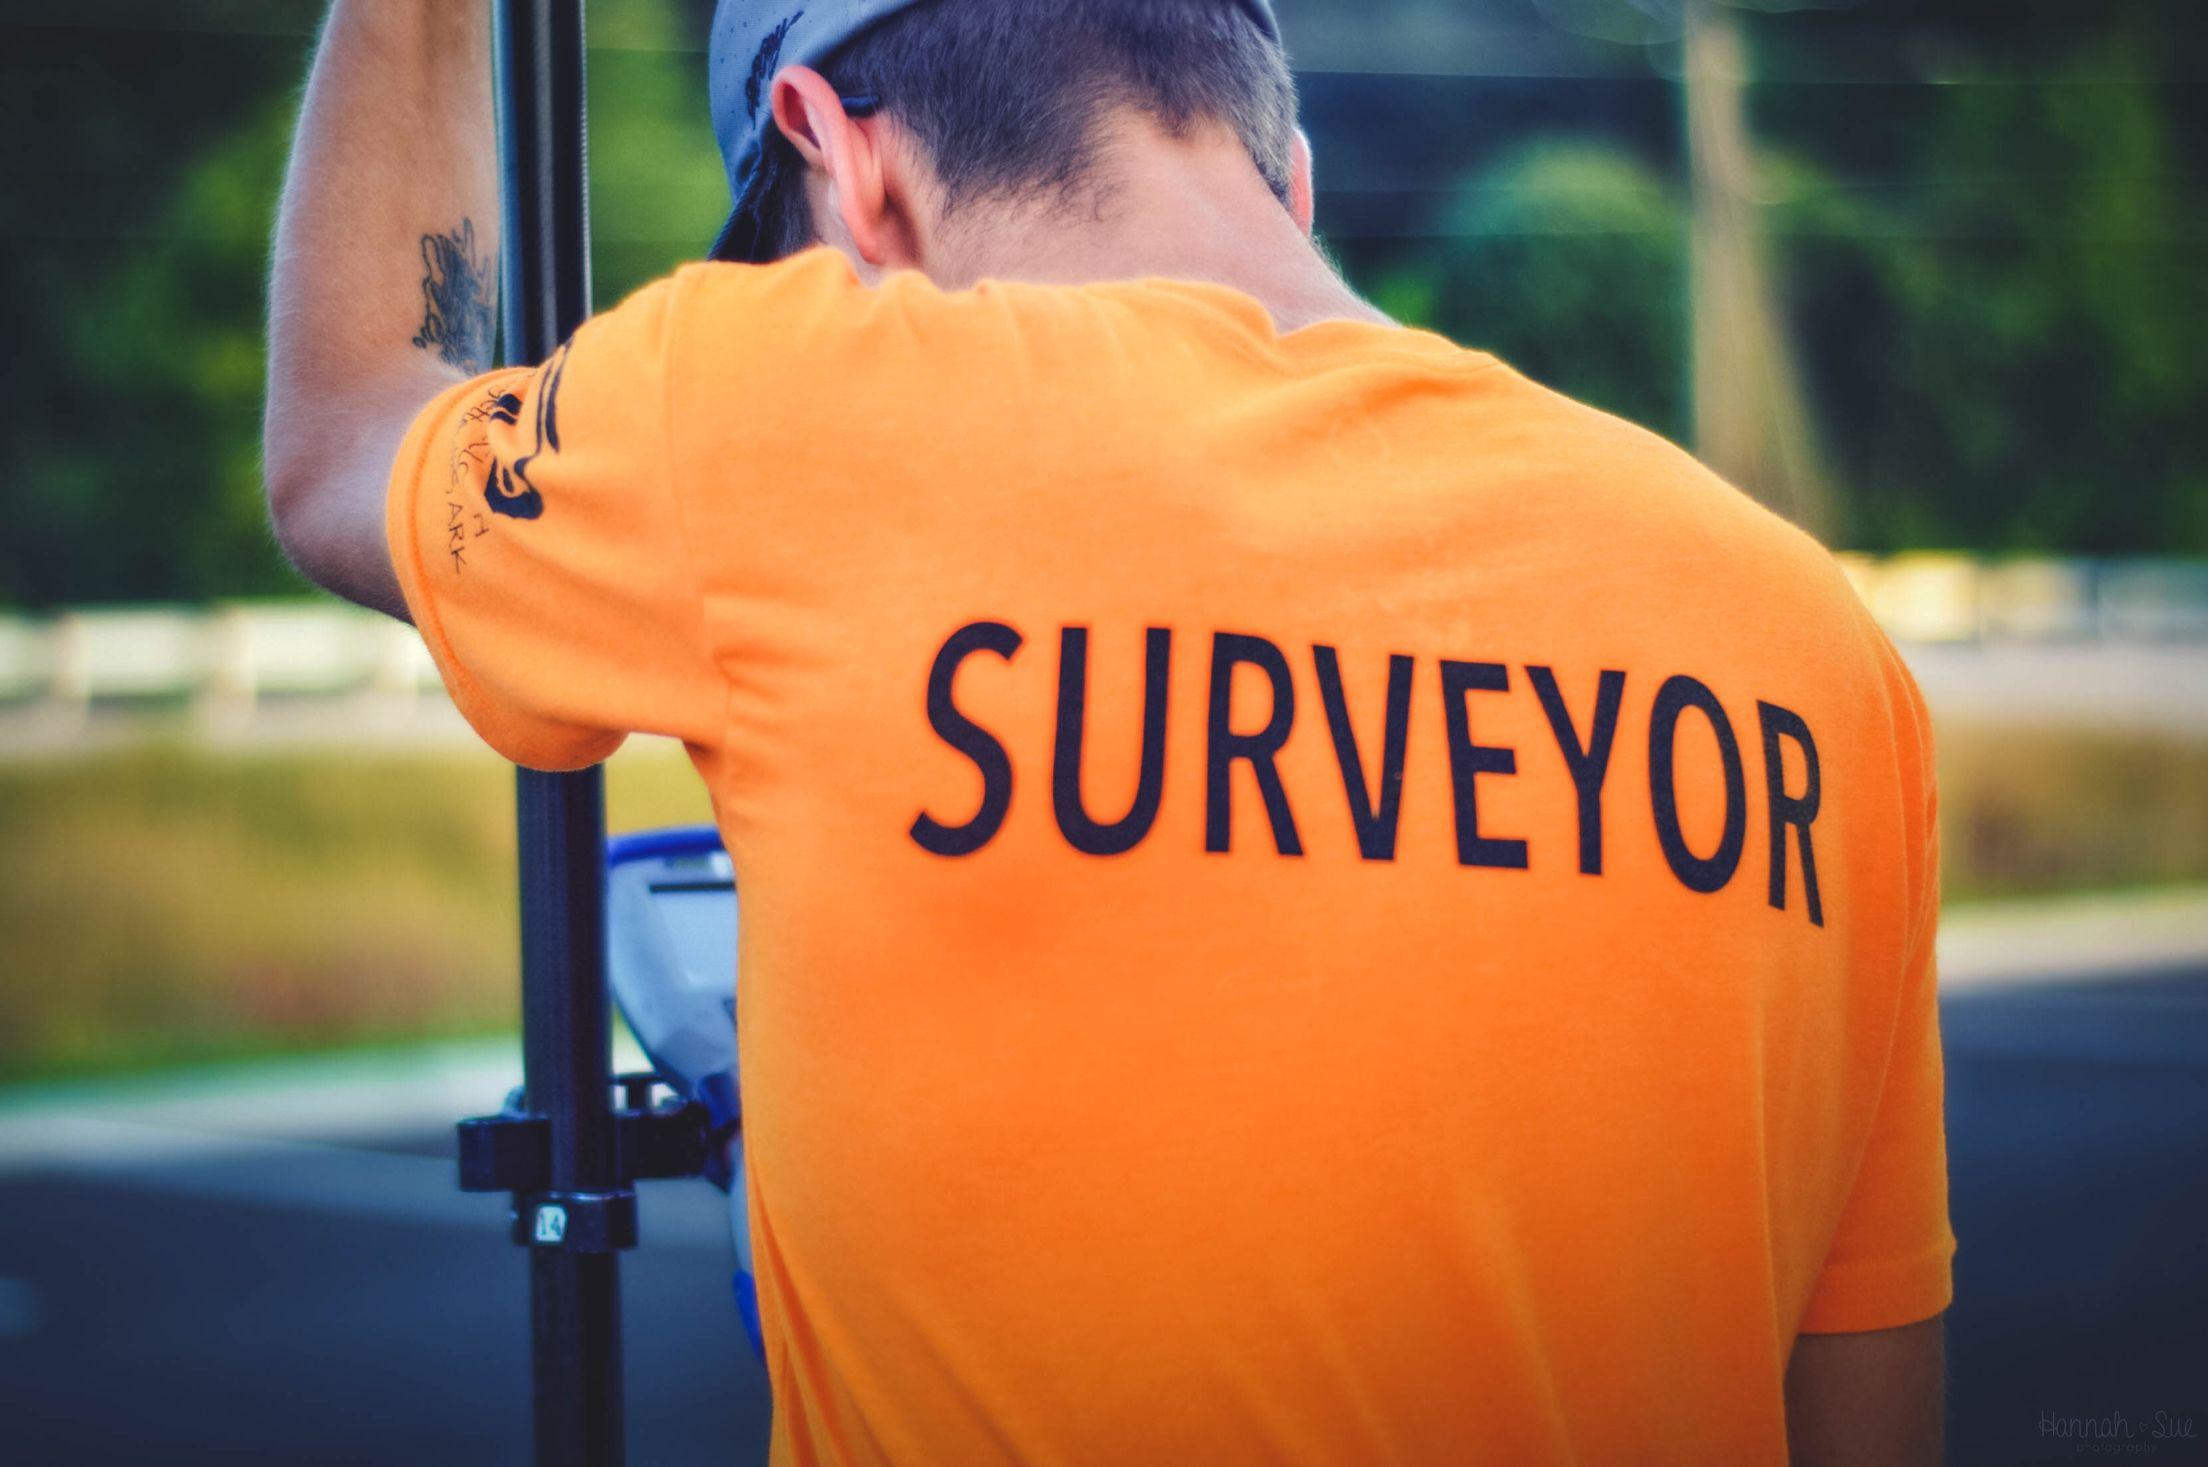 Boyfriend, land surveyor, GPS land surveyor, land surveying, blew